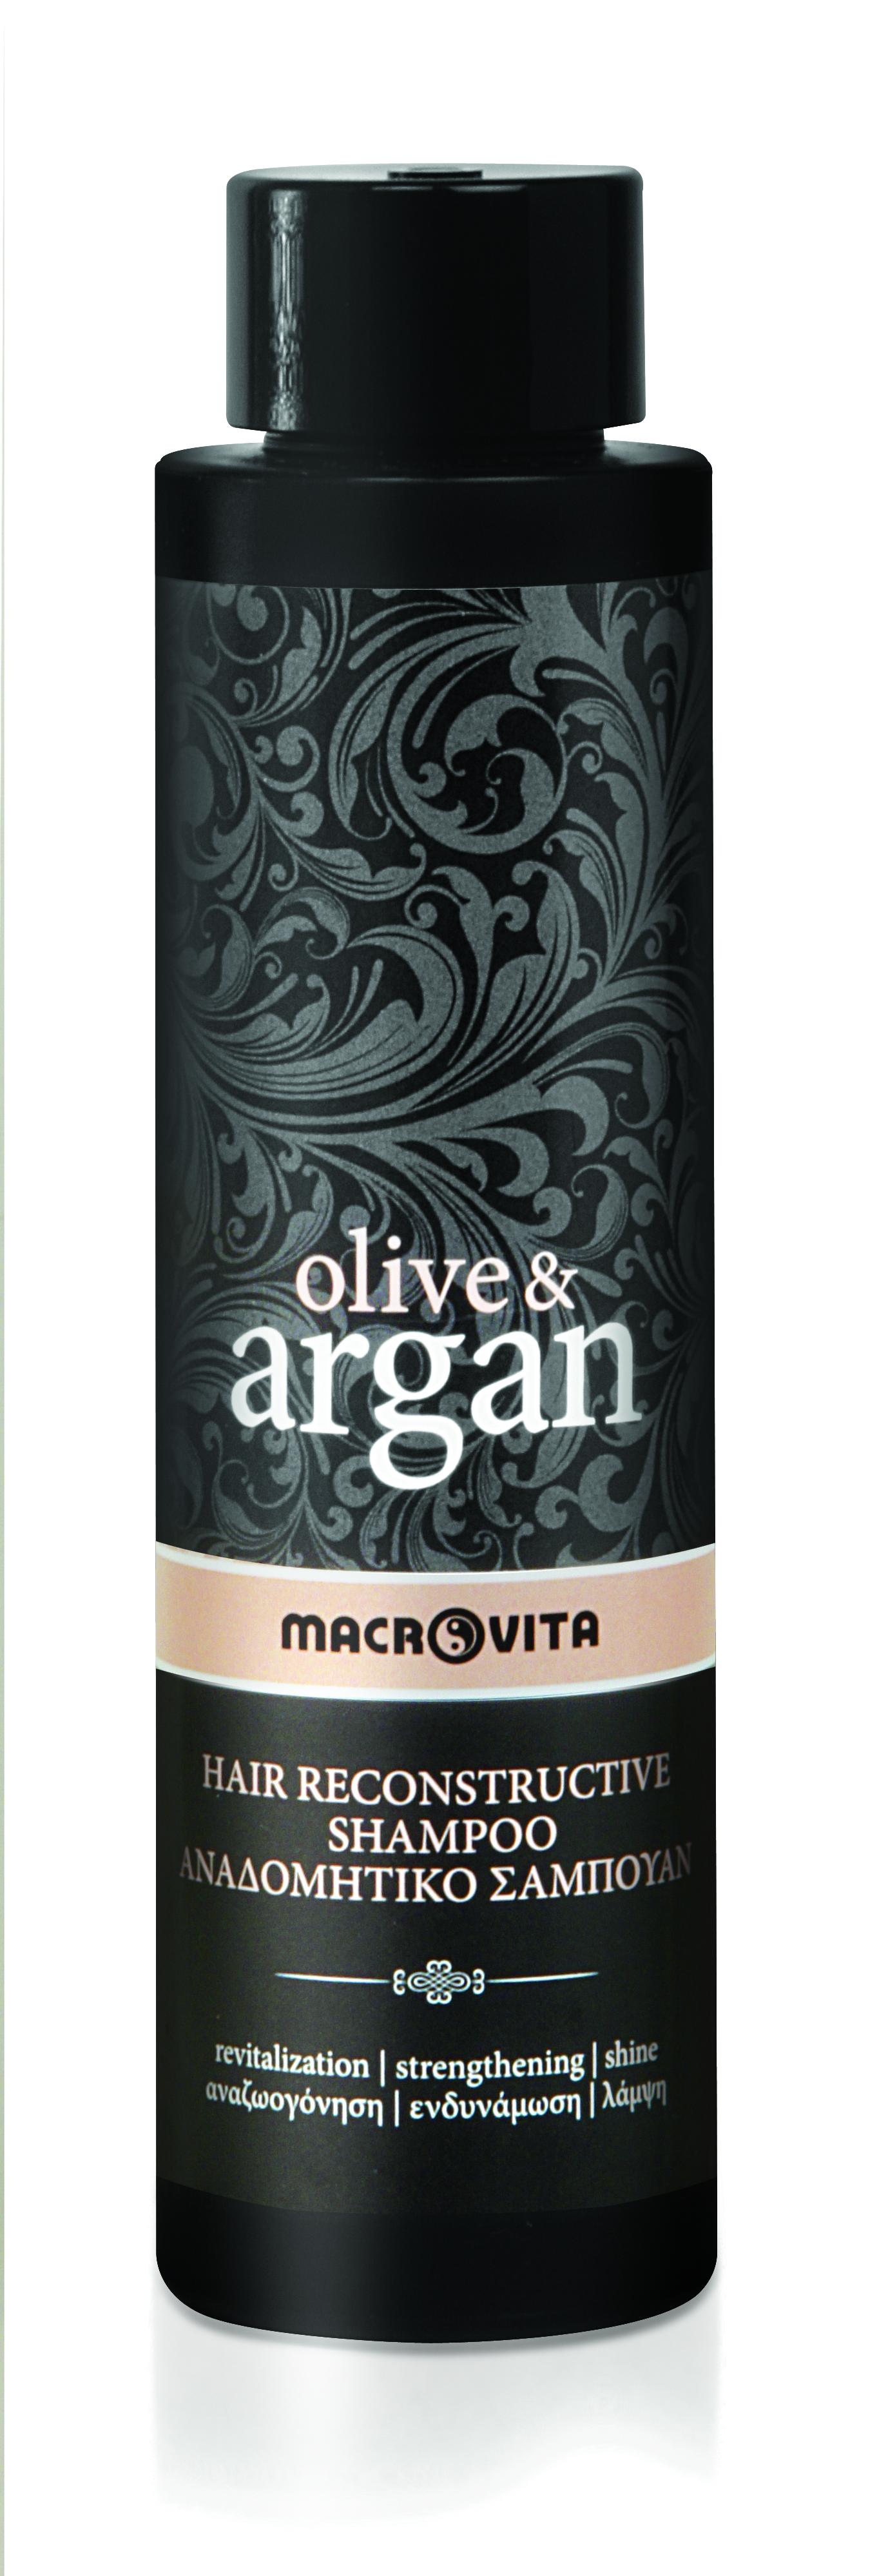 Macrovita Olive & Argan Hair Reconstructive Shampoo Αναδομητικό Σαμπουάν 200ml